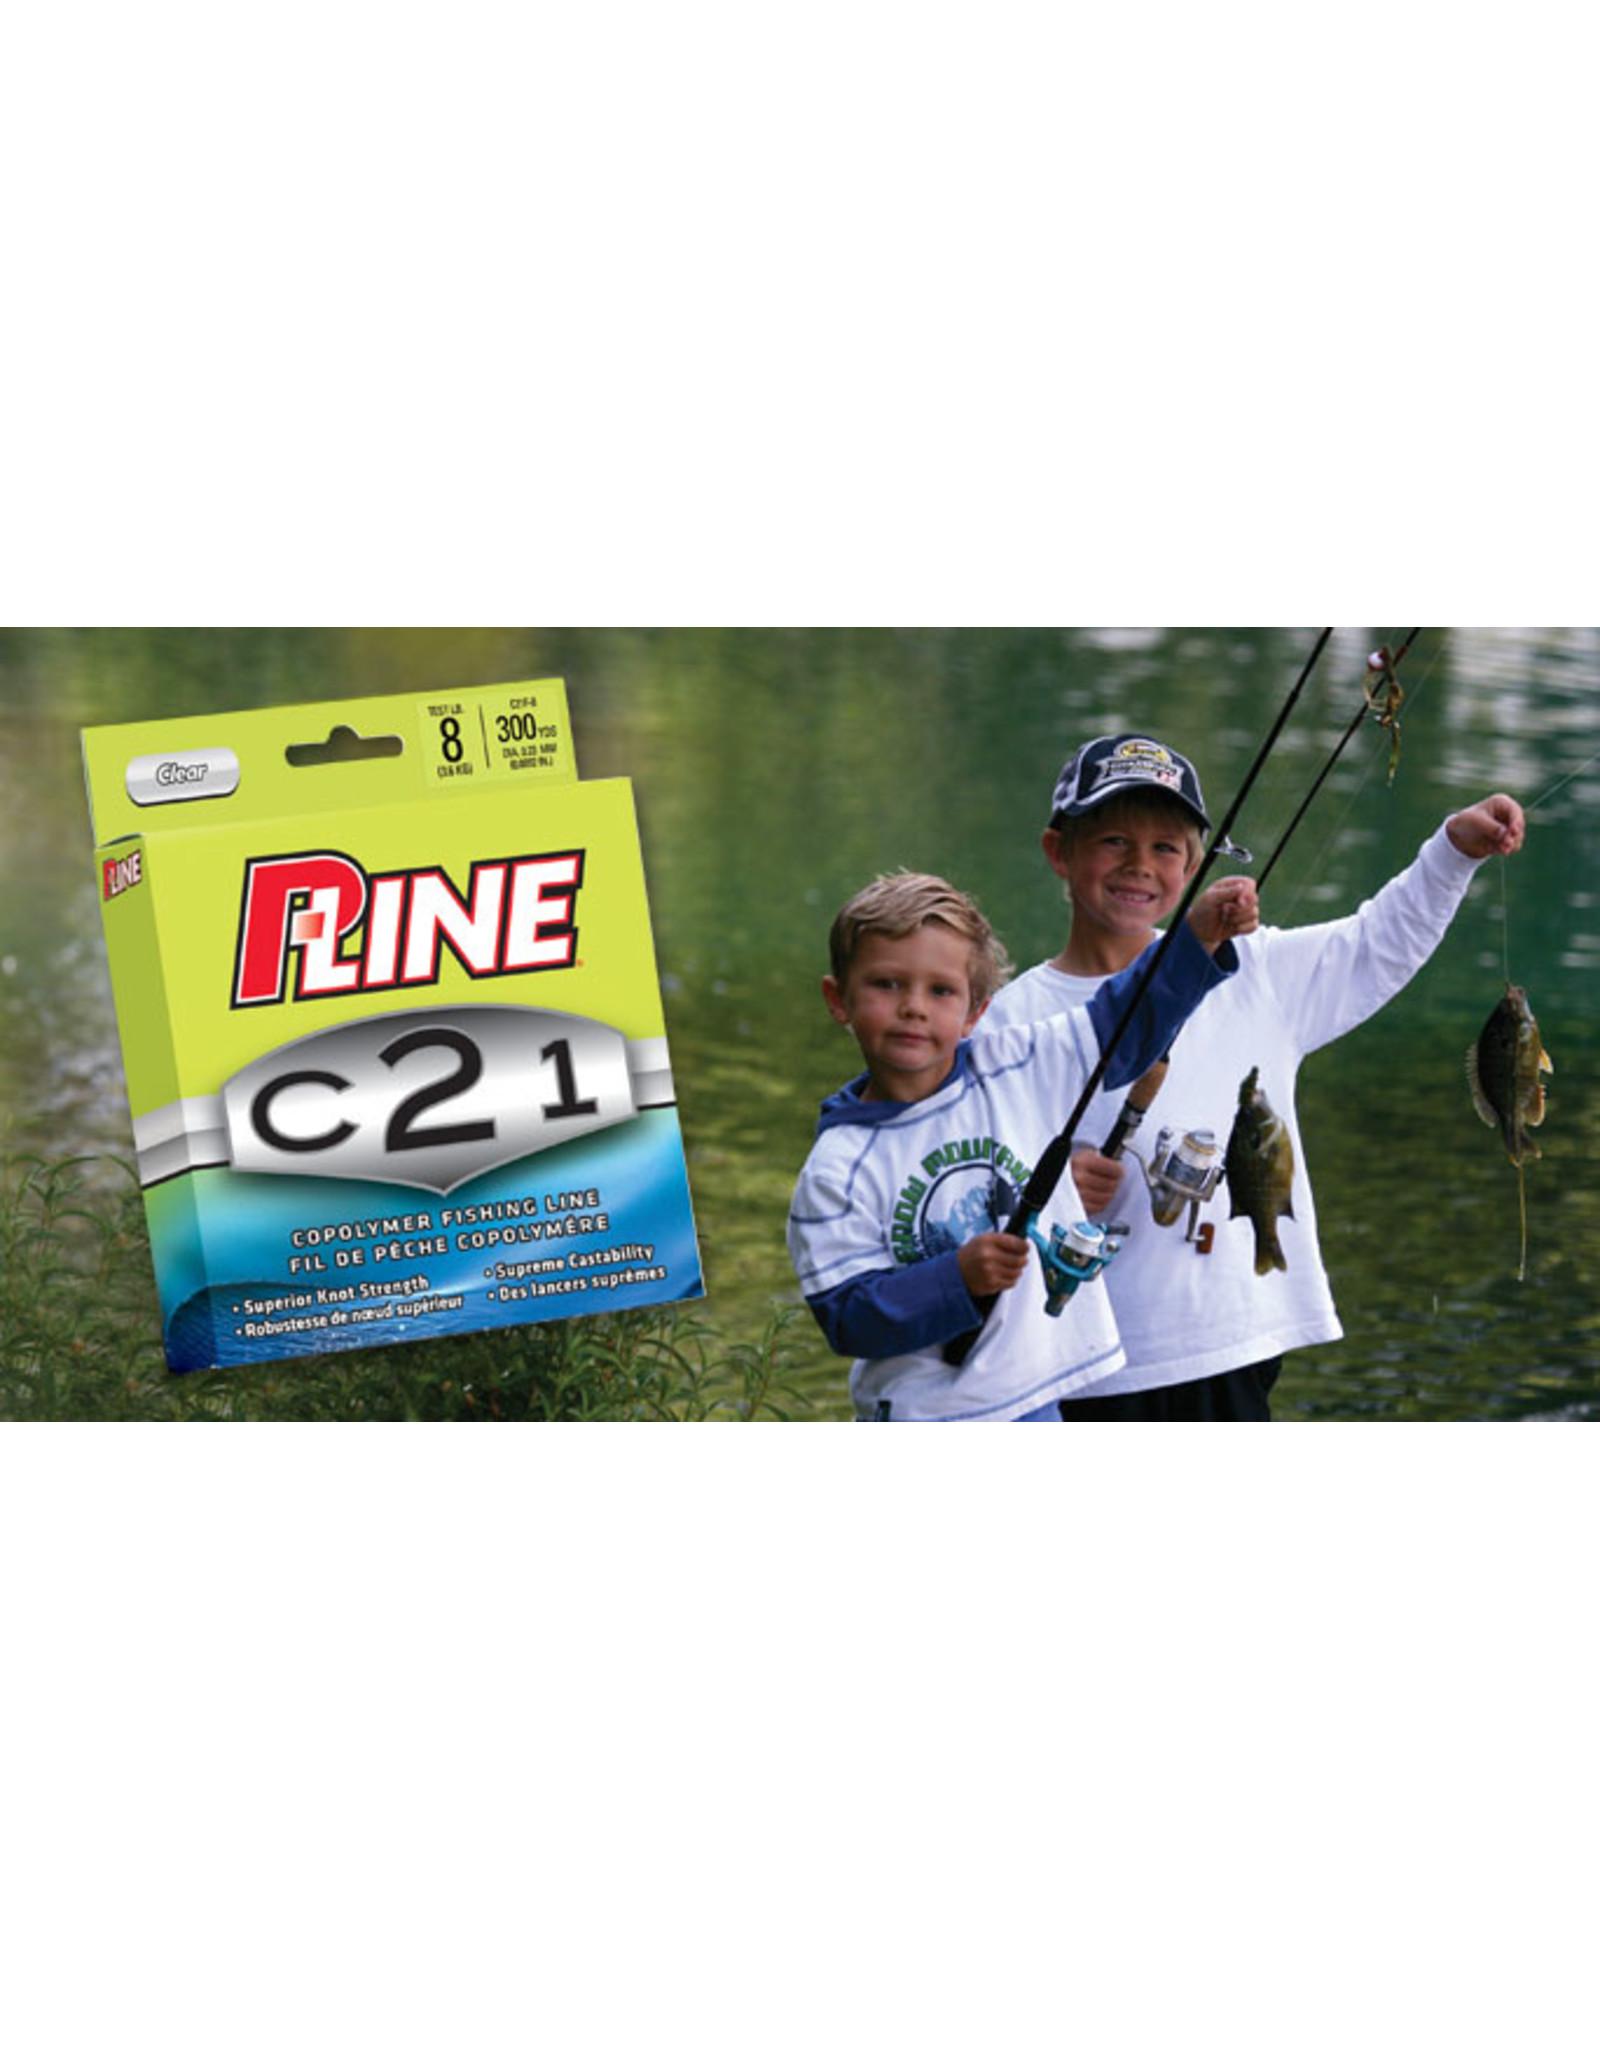 P-Line P-line C21 copolymer line